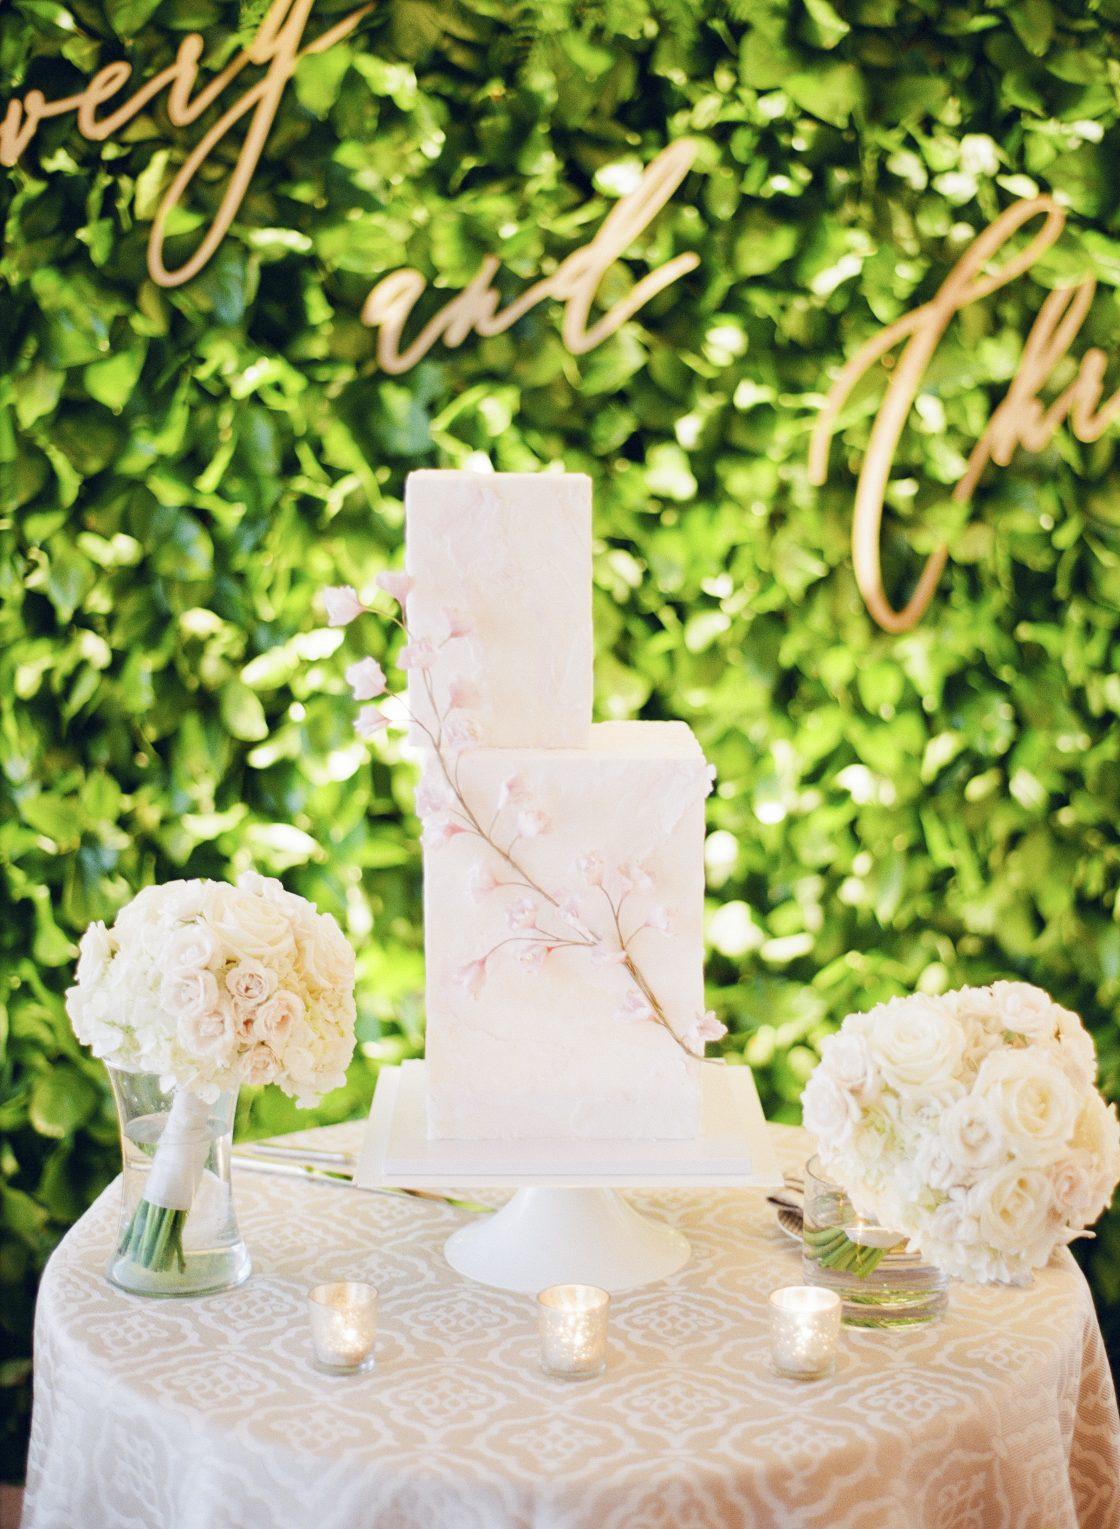 Modern Cherry Blossom Wedding Cake